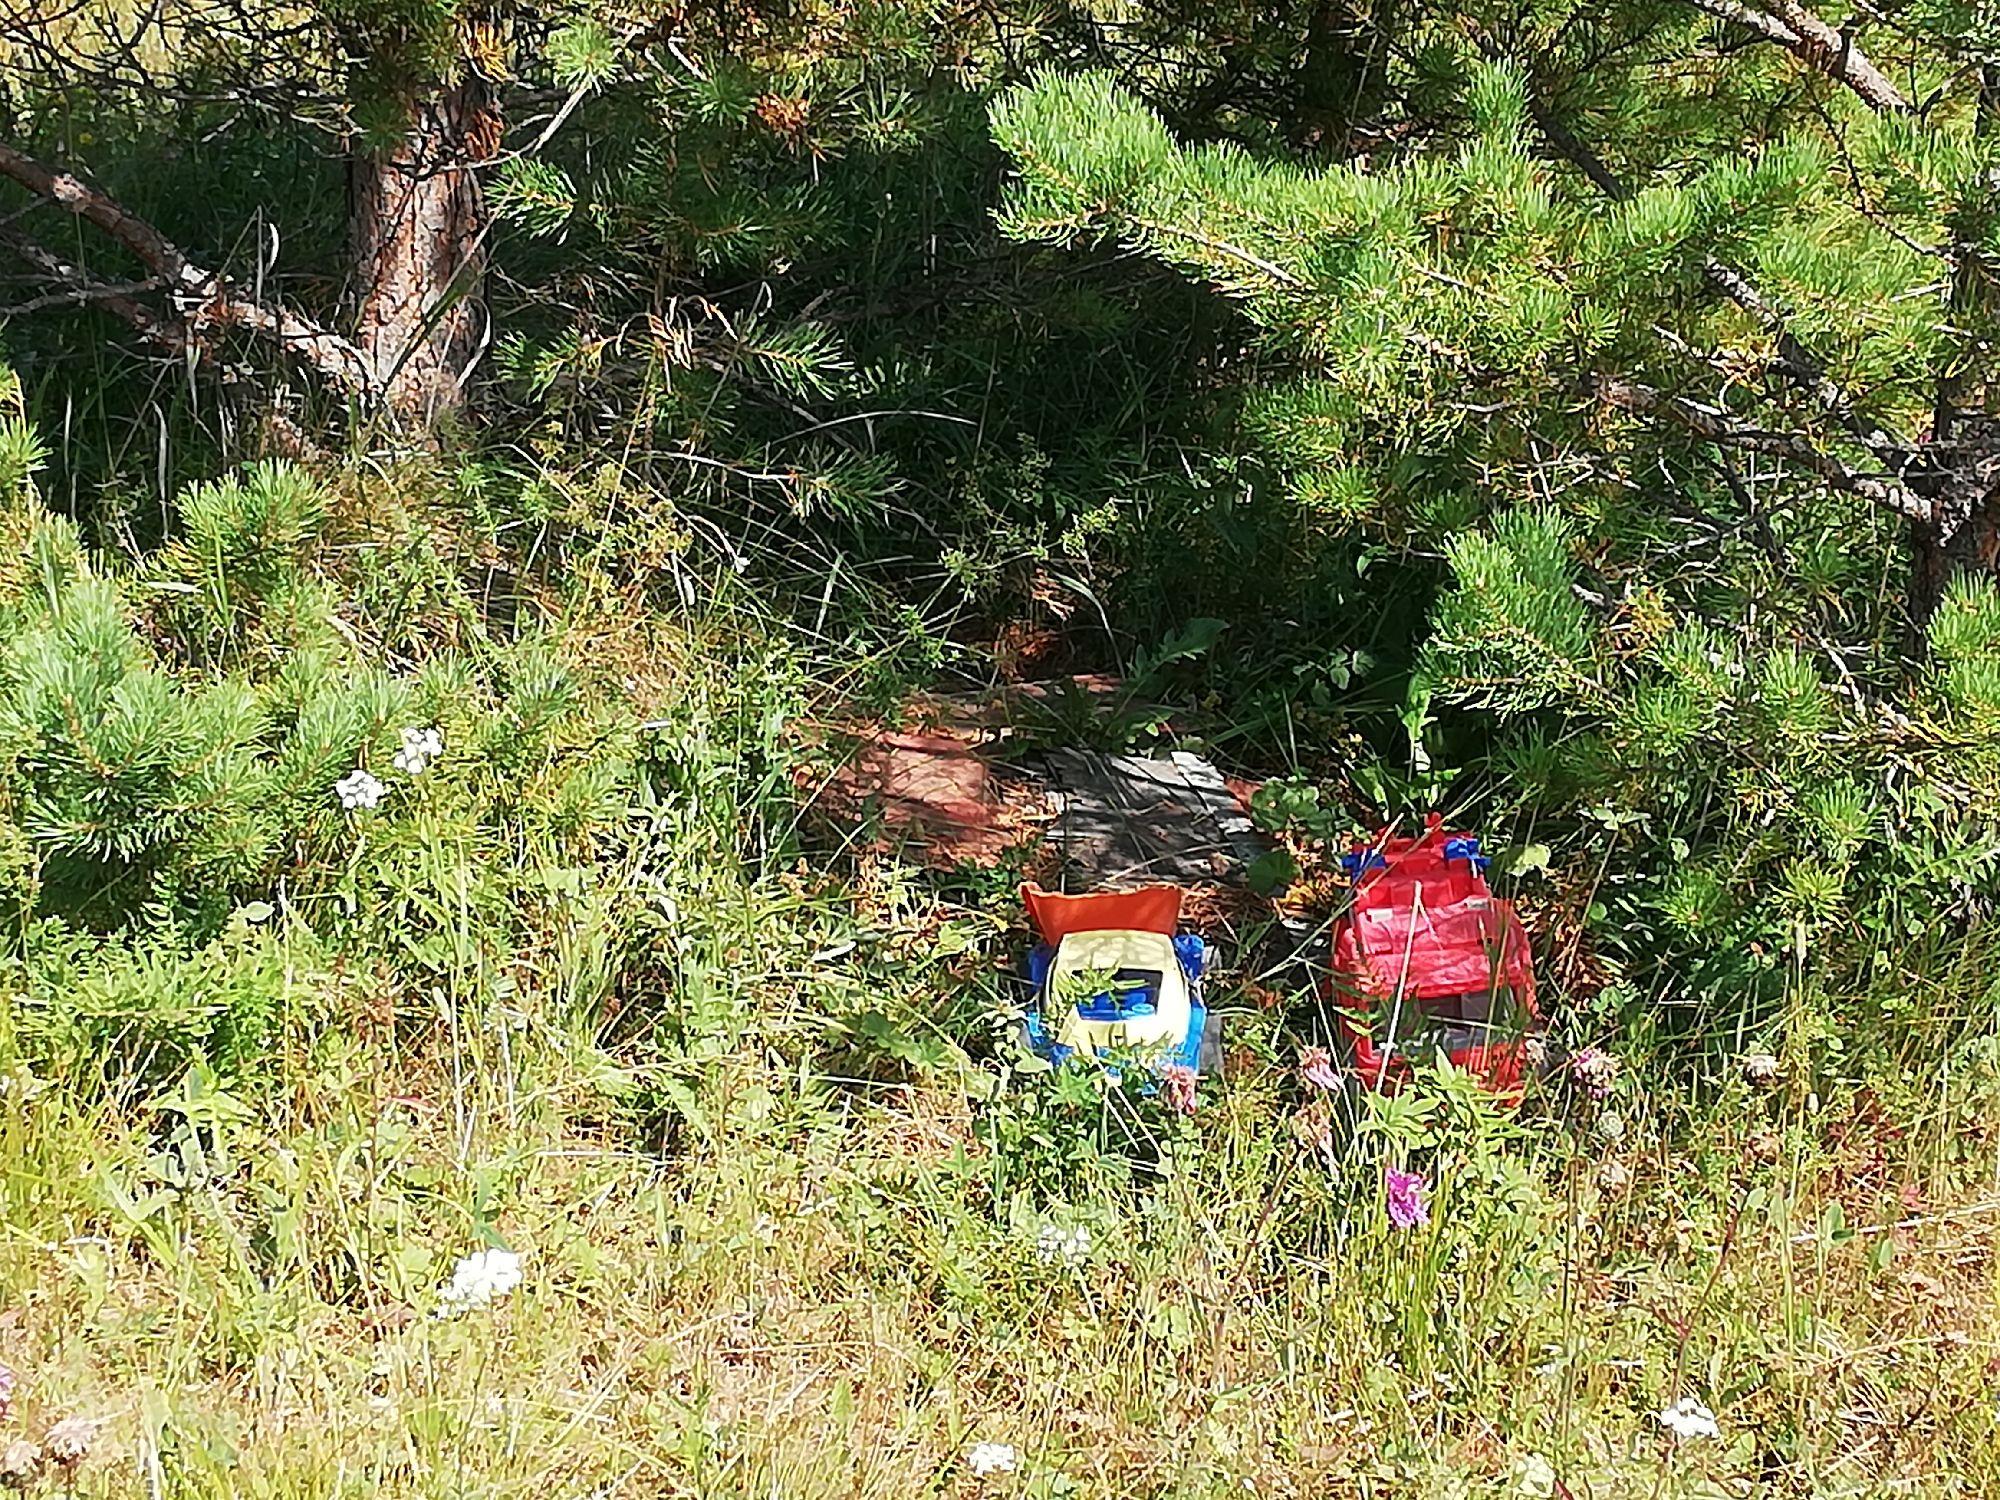 Странная находка - игрушки на опушке леса.